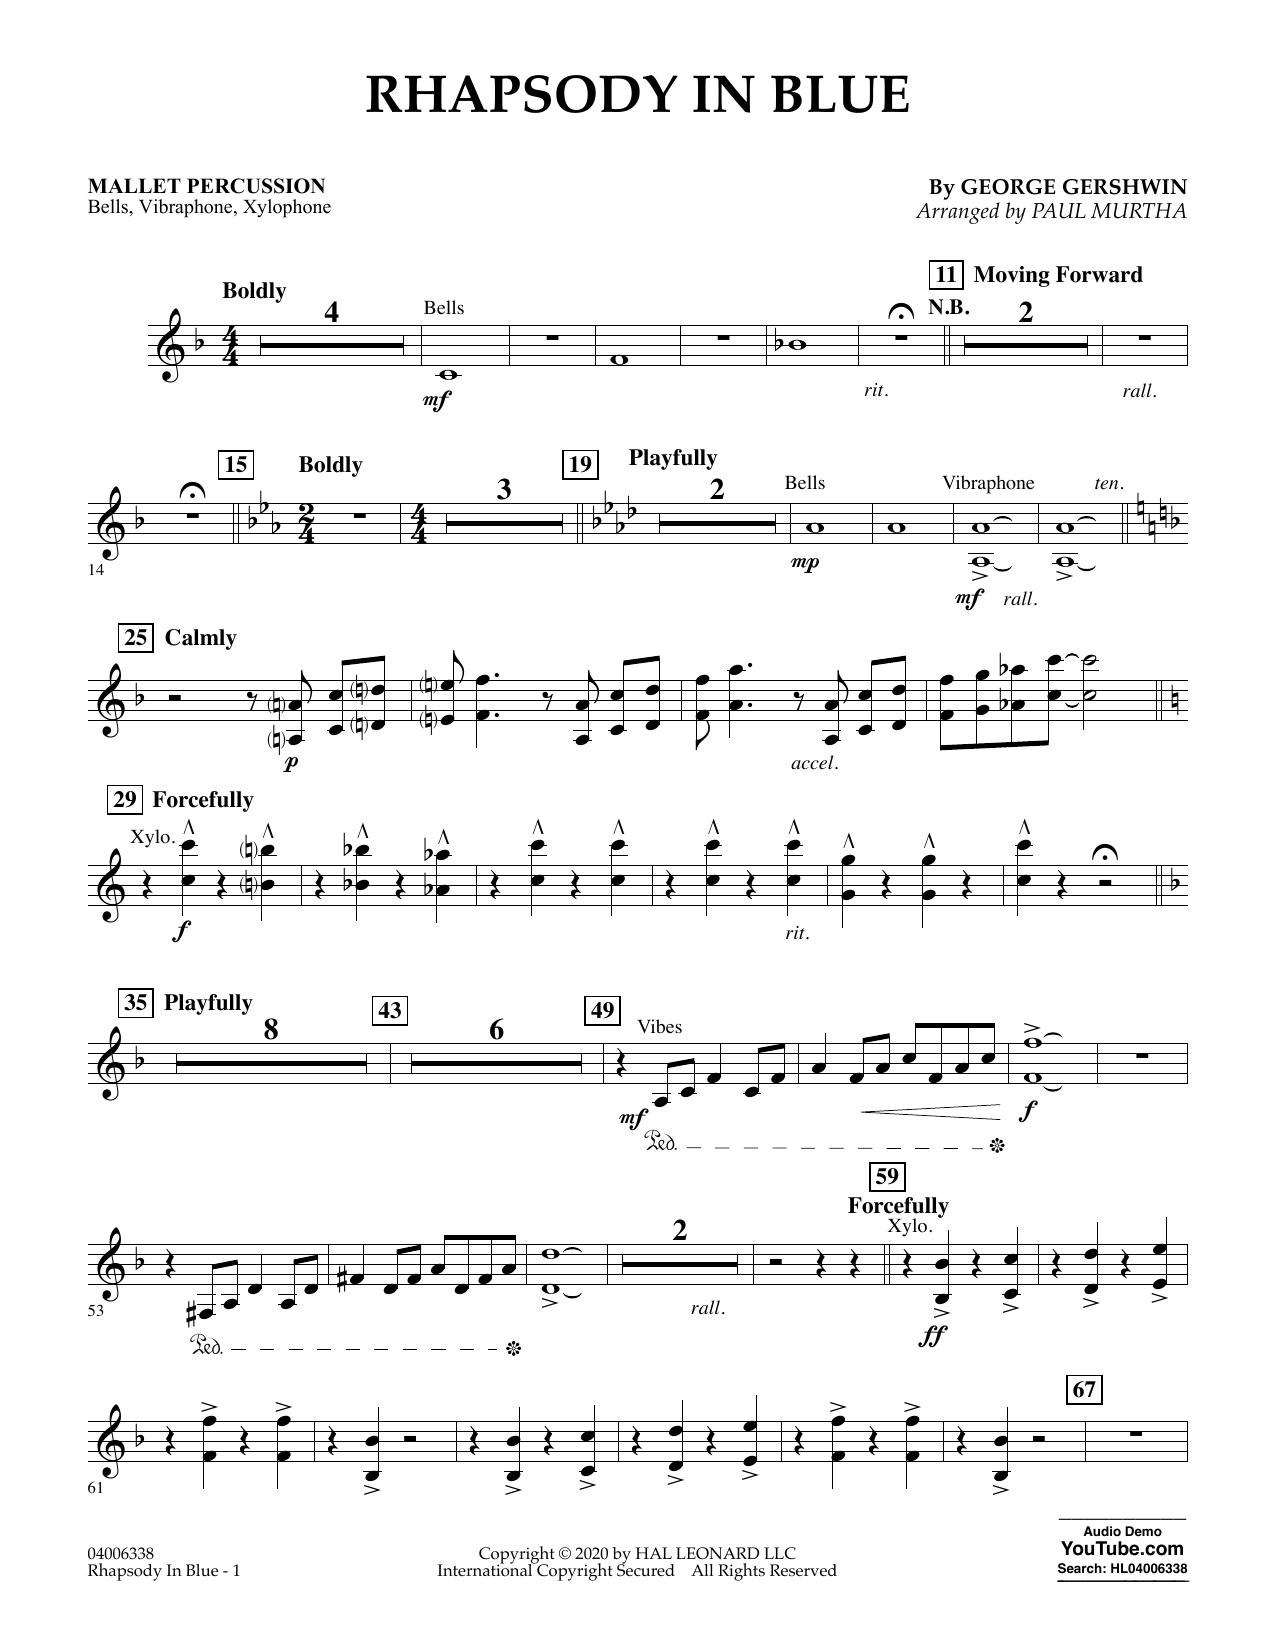 Rhapsody in Blue (arr. Paul Murtha) - Mallet Percussion (Flex-Band)